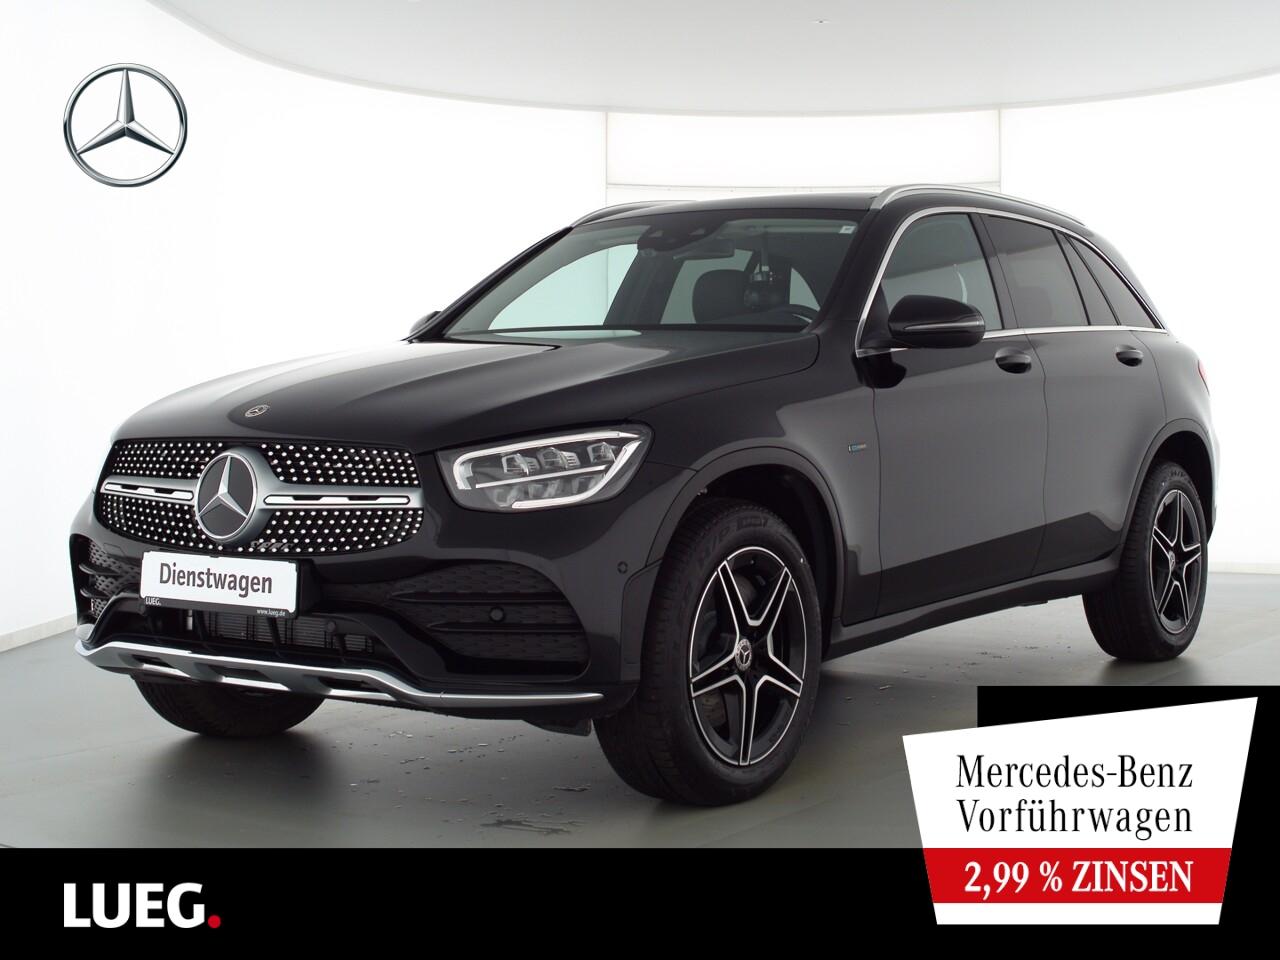 Mercedes-Benz GLC 300 e 4M AMG+DISTRONIC+PANO+AHK+KAMERA+LED, Jahr 2021, Hybrid